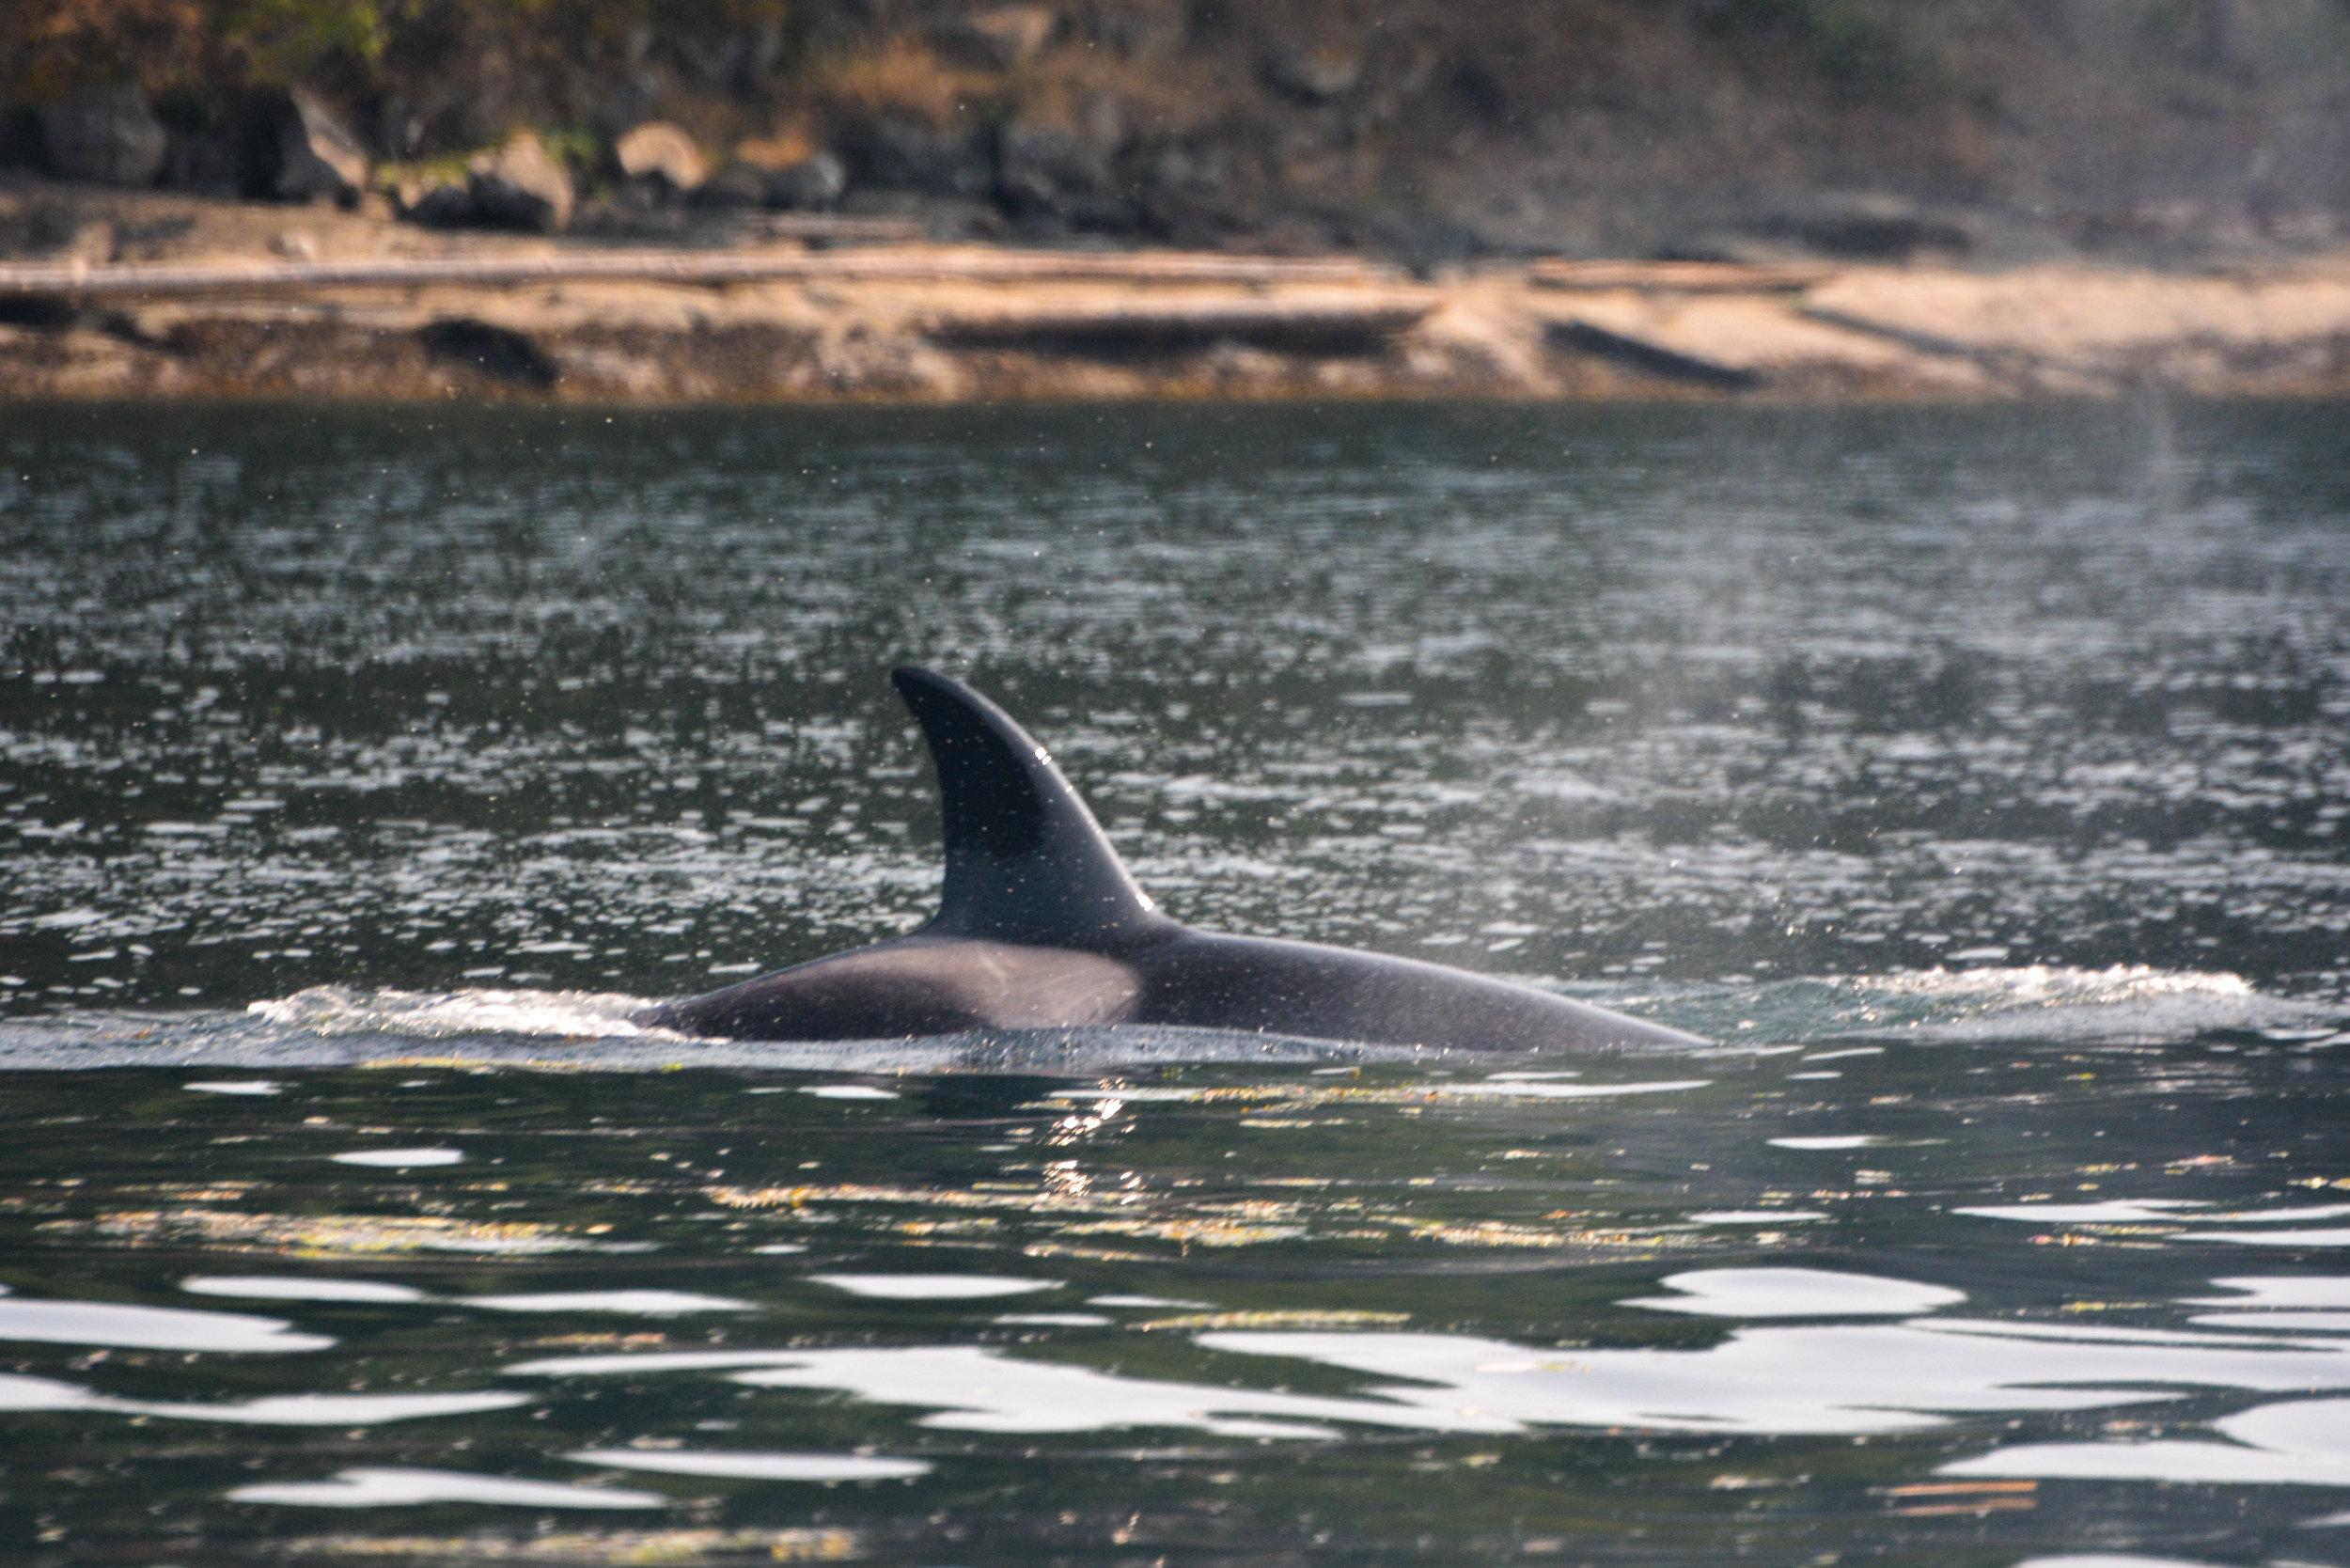 Orca surfacing just off the coastal shores. Photo by Val Watson.